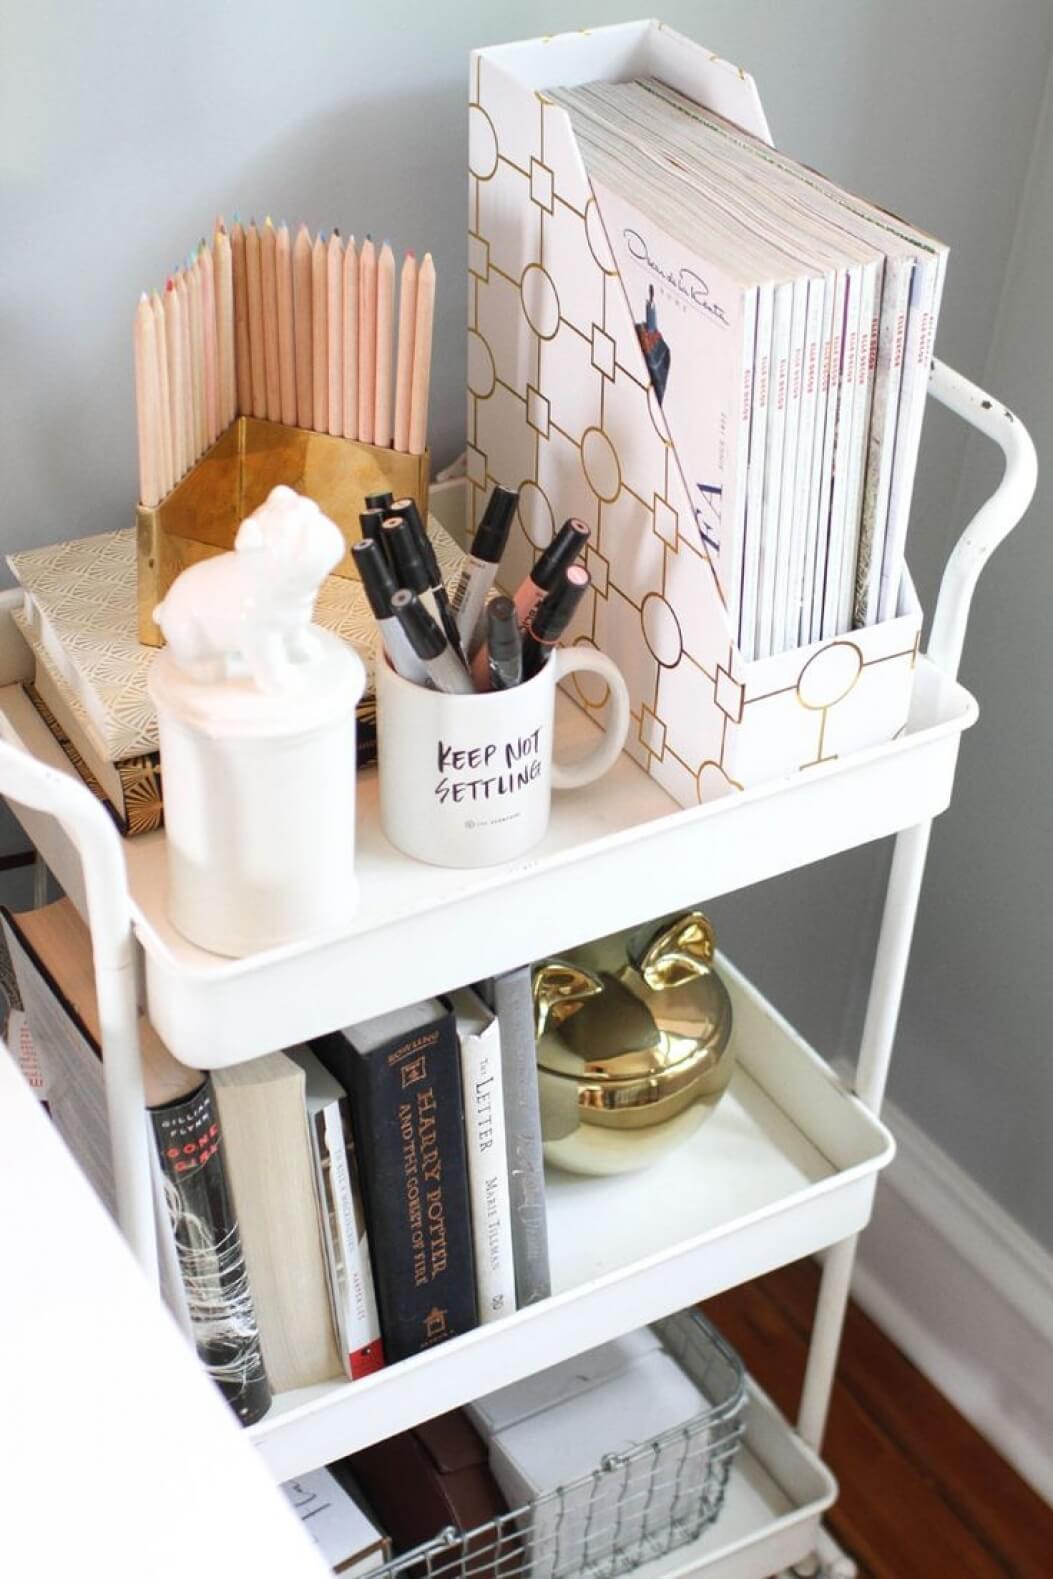 Bookshelf study table